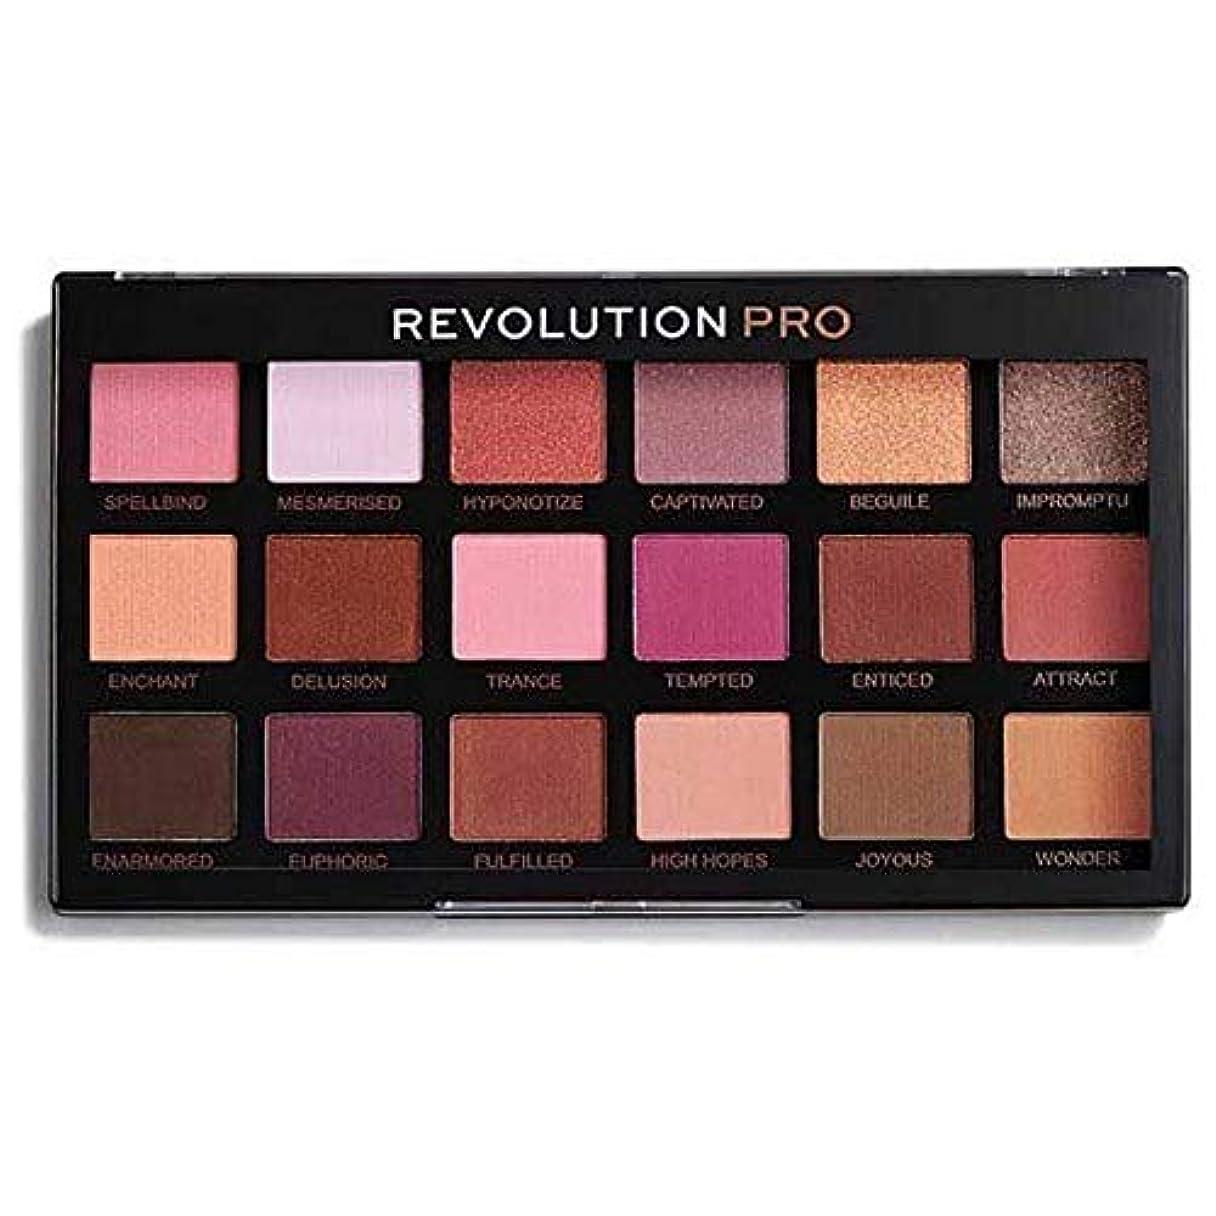 [Revolution ] アイシャドウパレットうっとり革命プロ再生 - Revolution Pro Regeneration Entranced Eye Shadow Palette [並行輸入品]